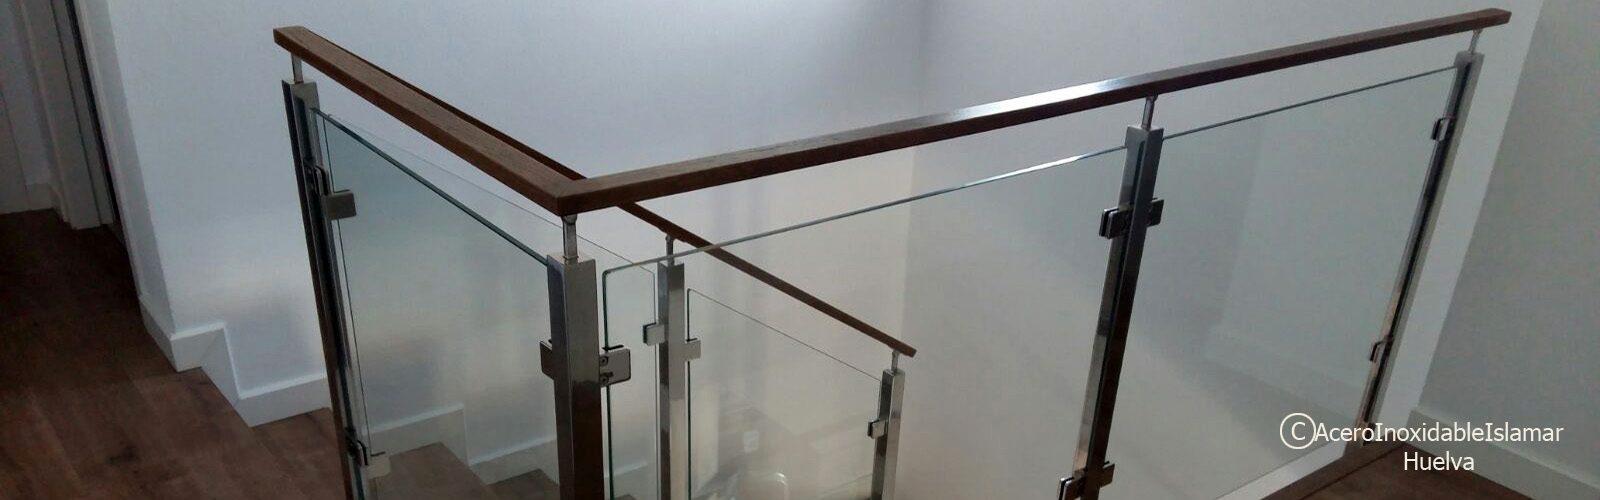 Baranda escalera Acero Inoxidable Islamar Huelva